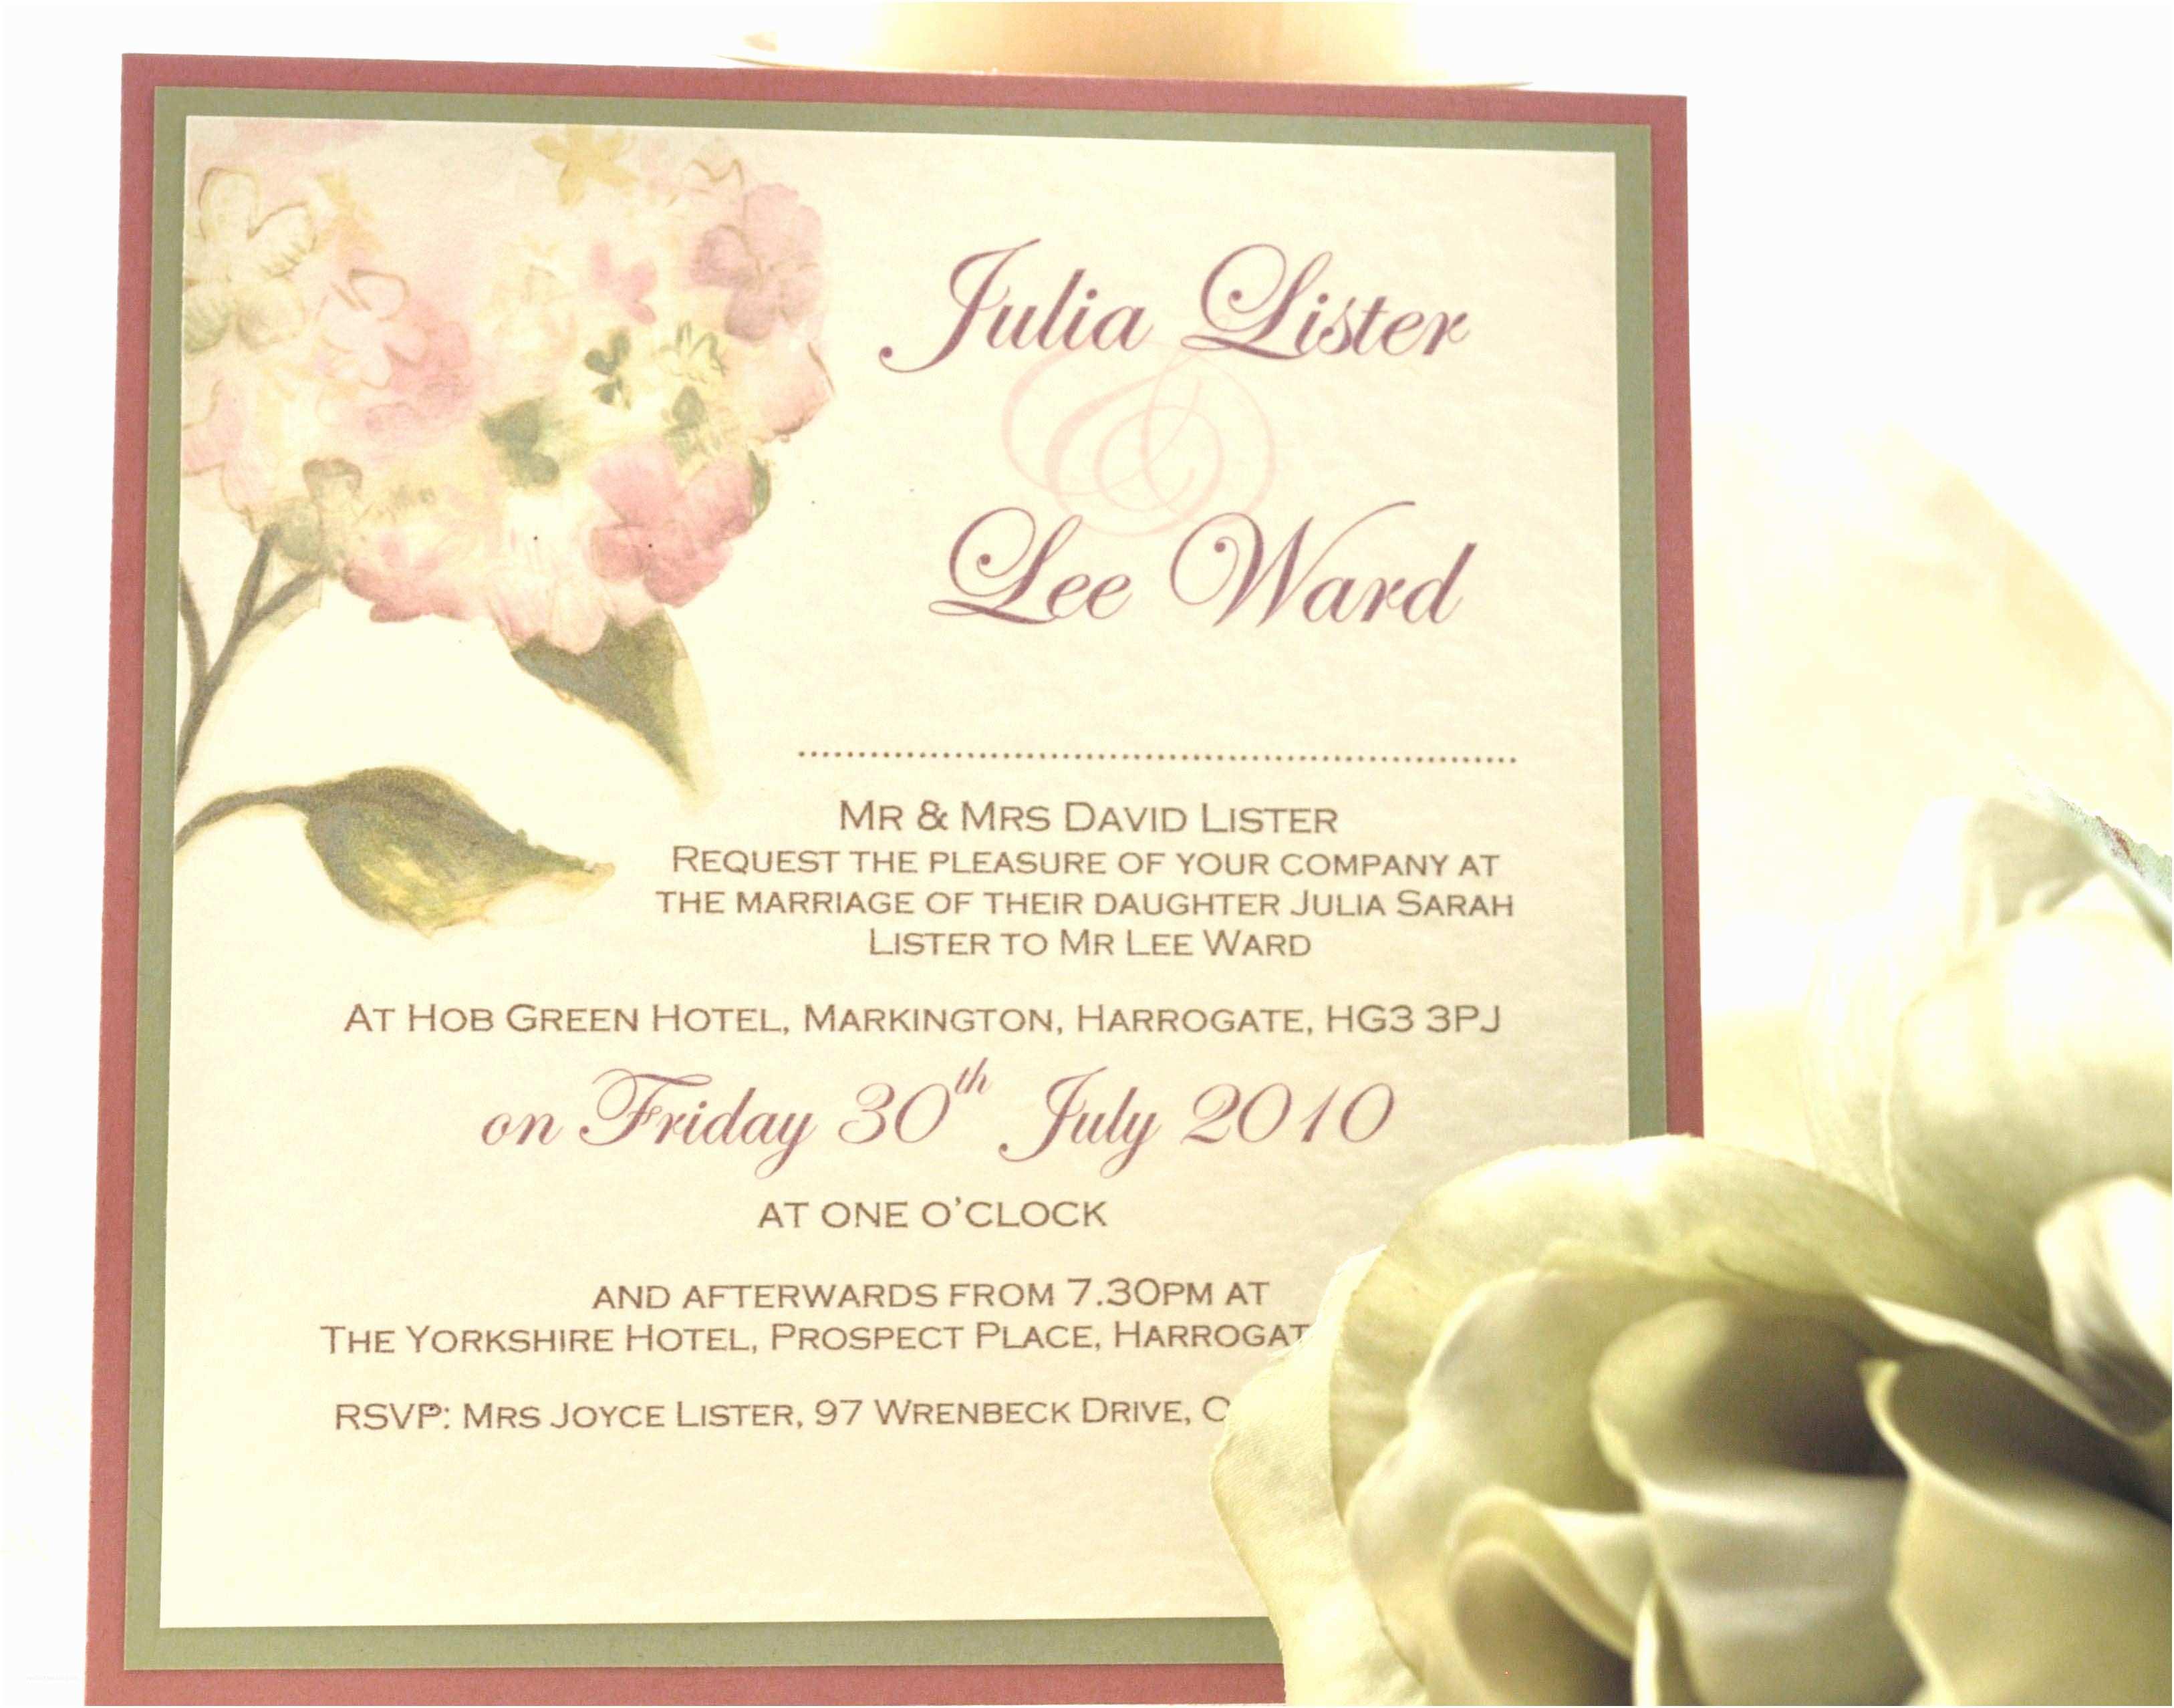 Samples Of Wedding Invitations Wedding Invitation Wording Wedding Invitation Template Sample